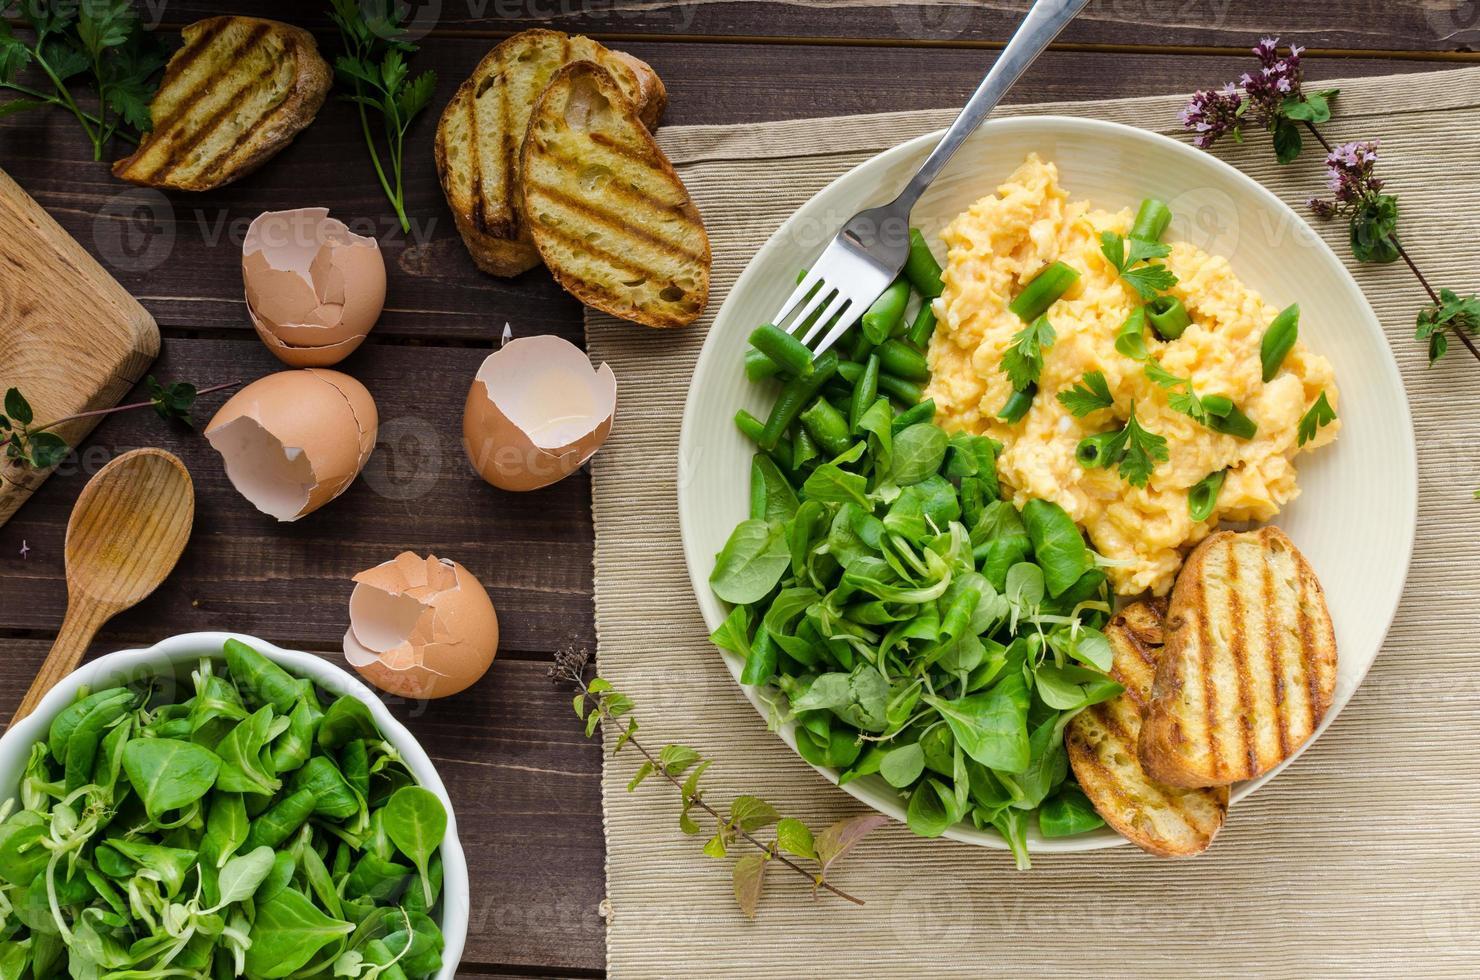 oeufs brouillés avec salade photo